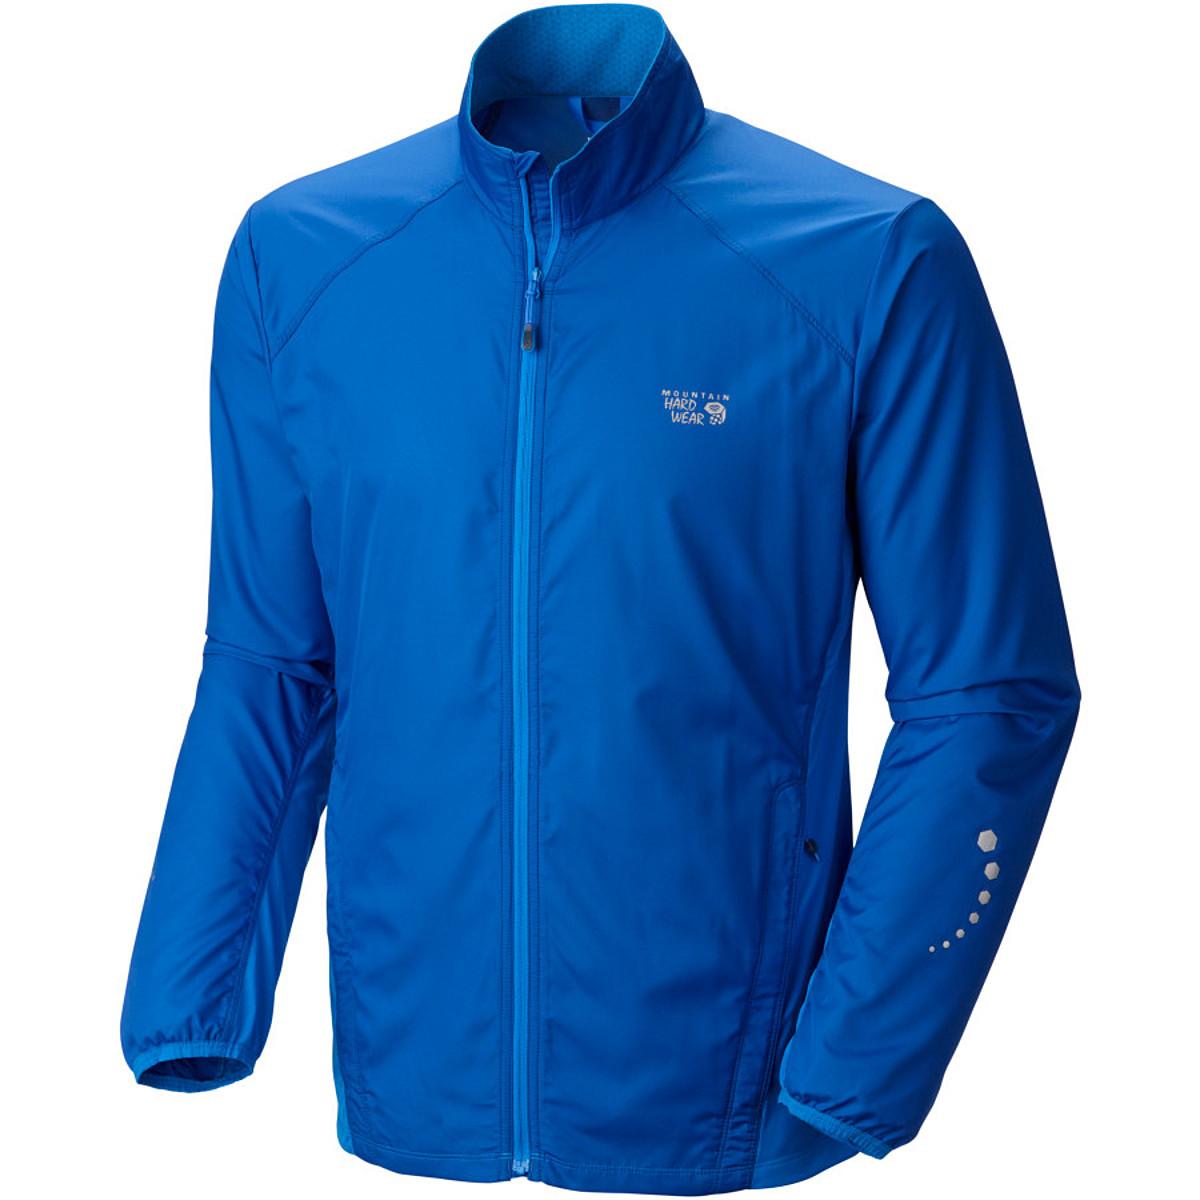 Mountain Hardwear Dryrunner Jacket